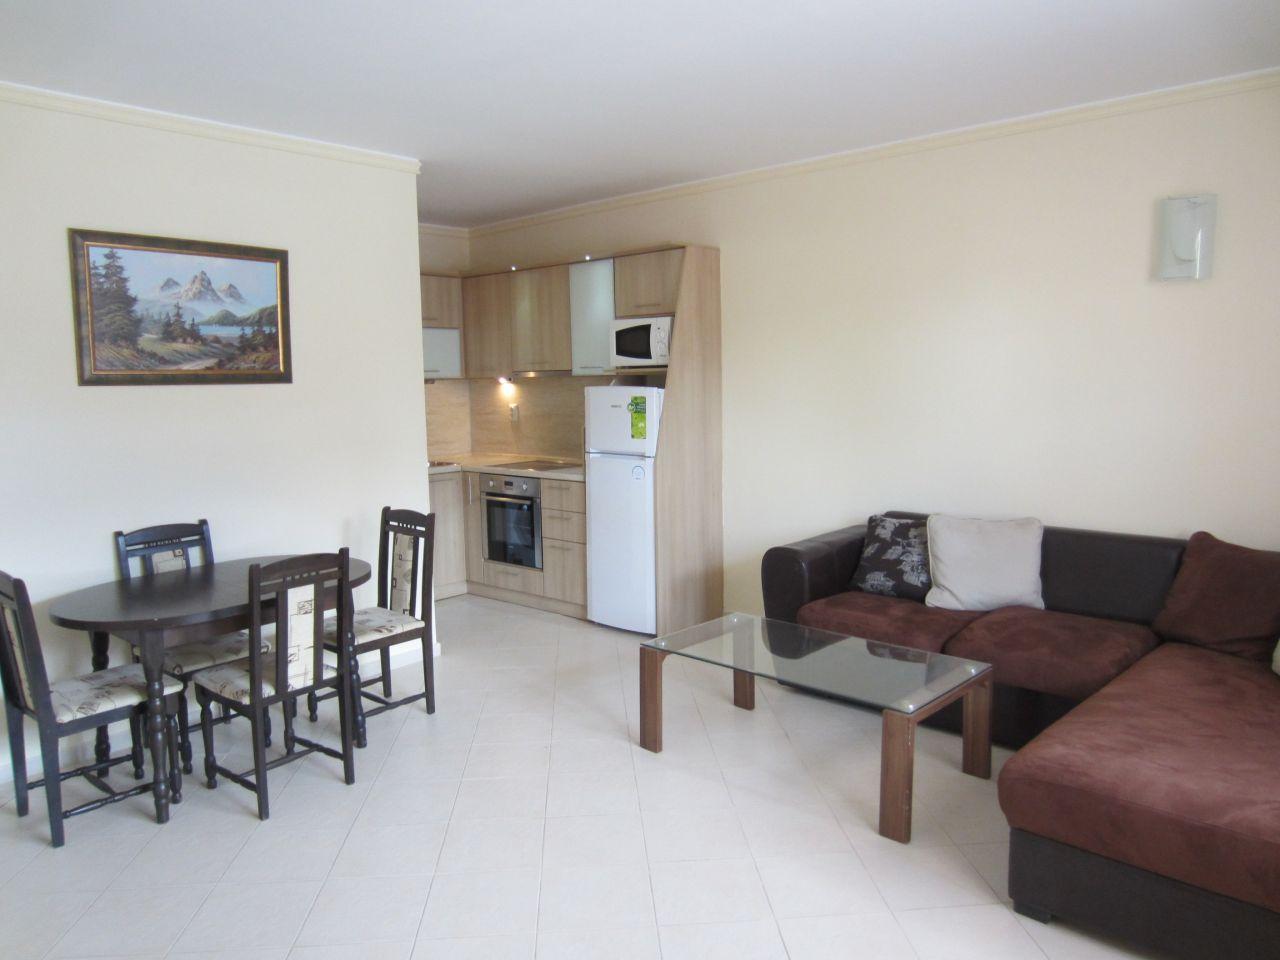 Квартира в Бургасе, Болгария, 80 м2 - фото 1